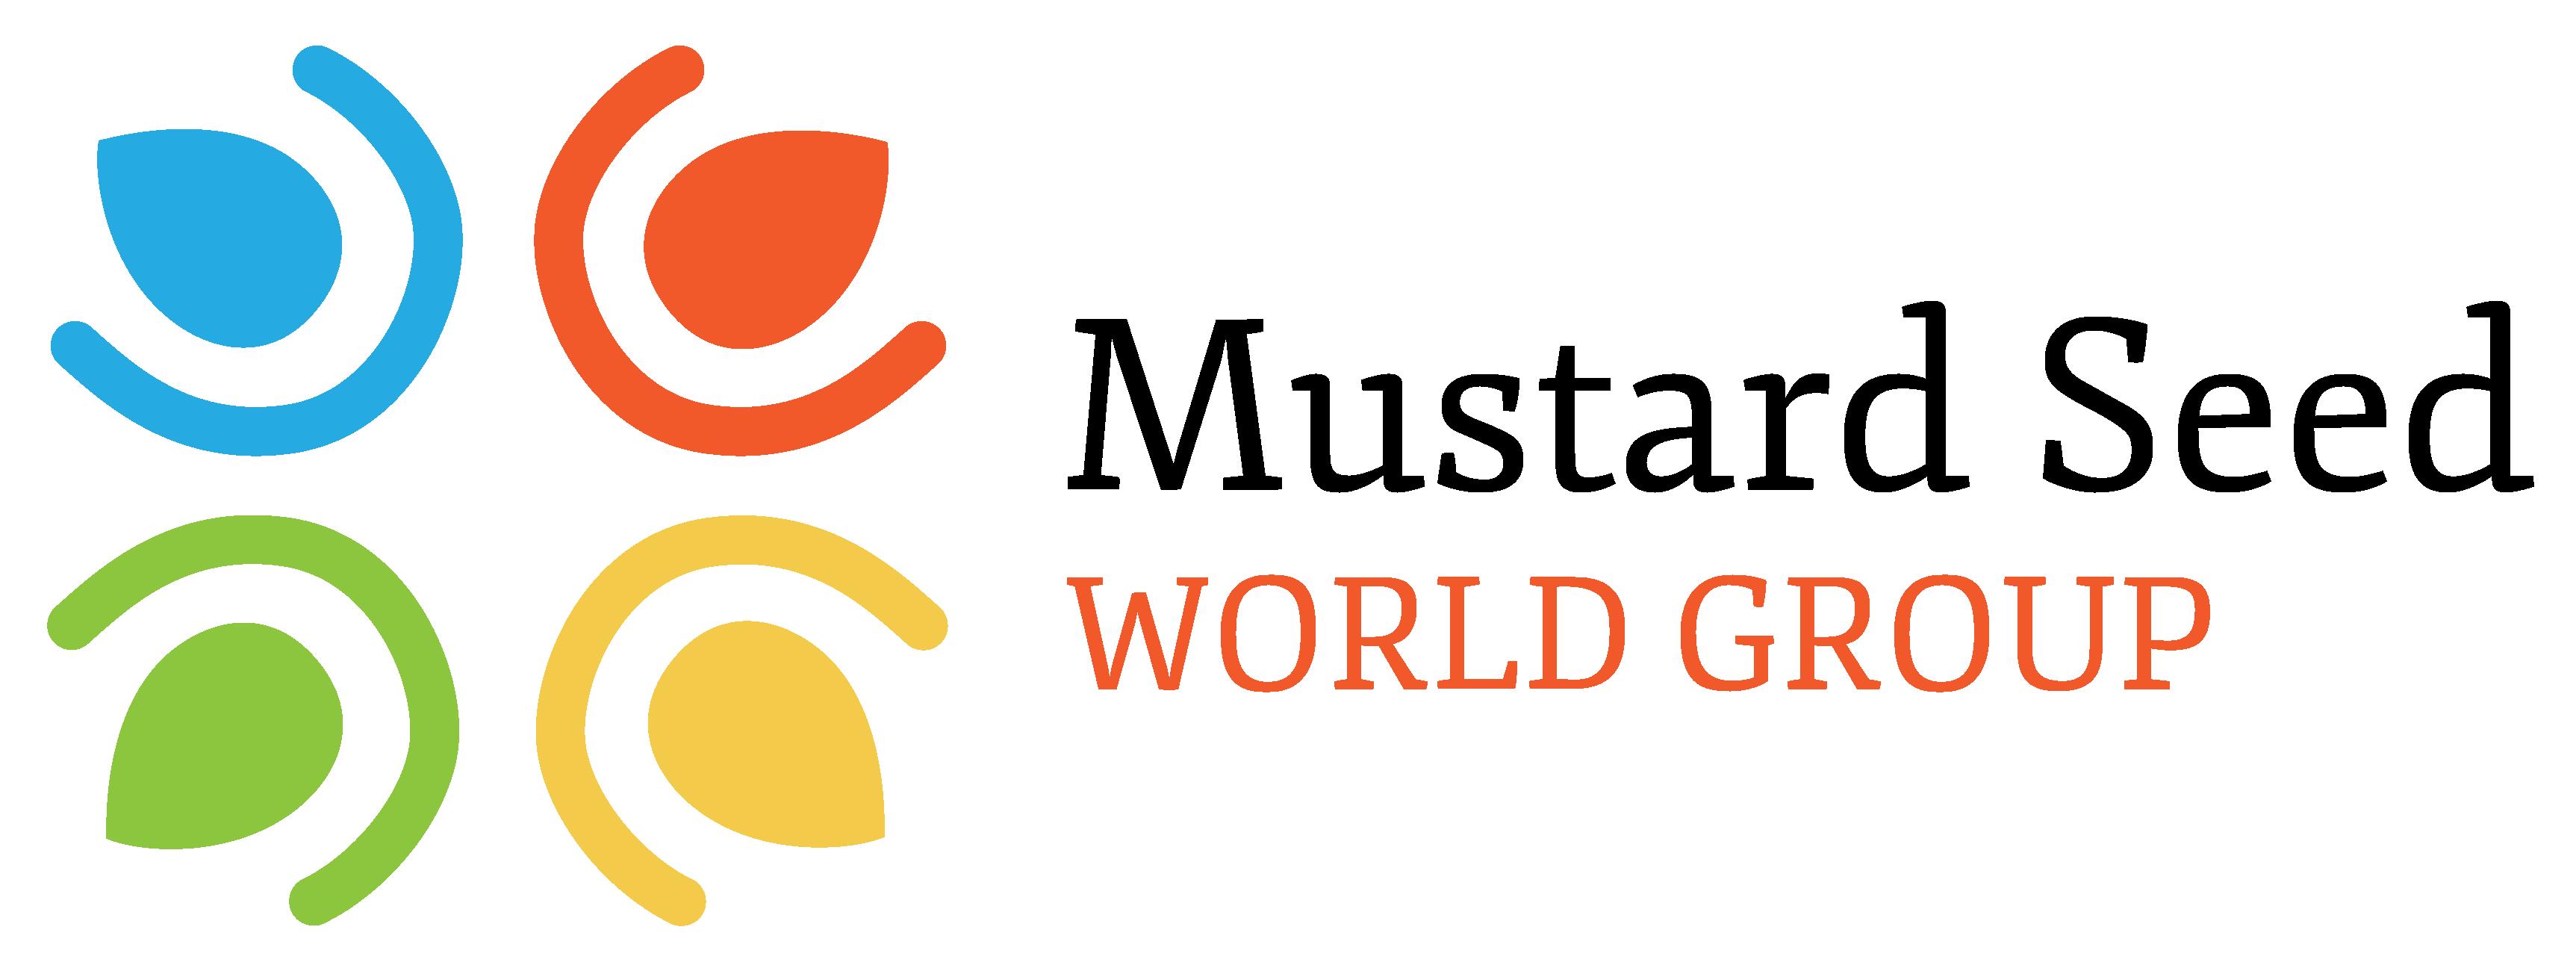 Mustard Seed World Group